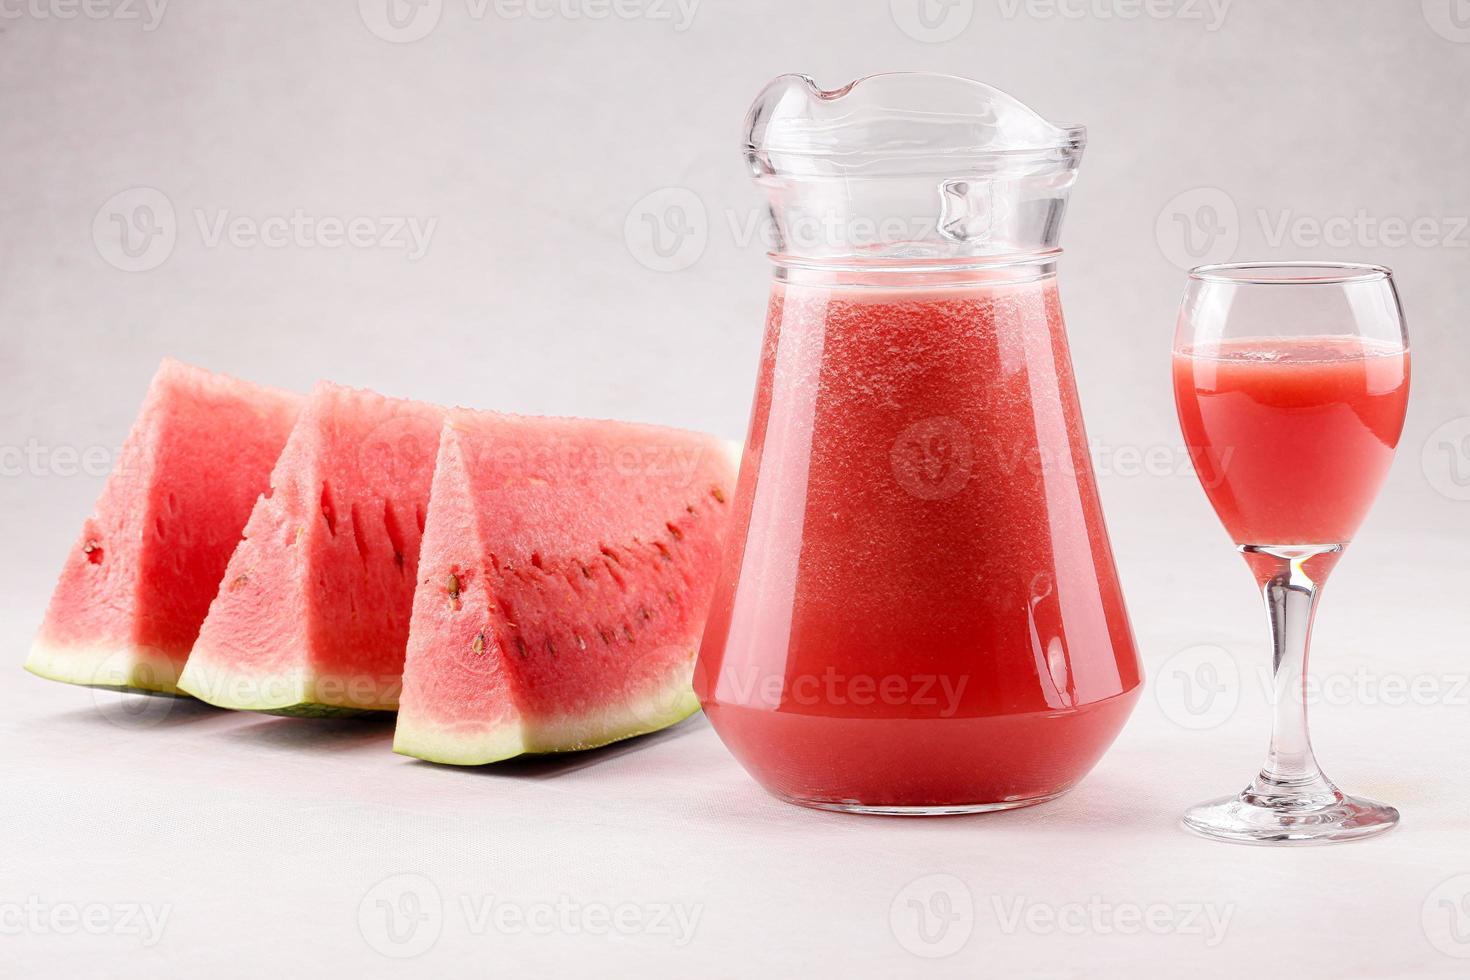 melancia e suco de melancia foto